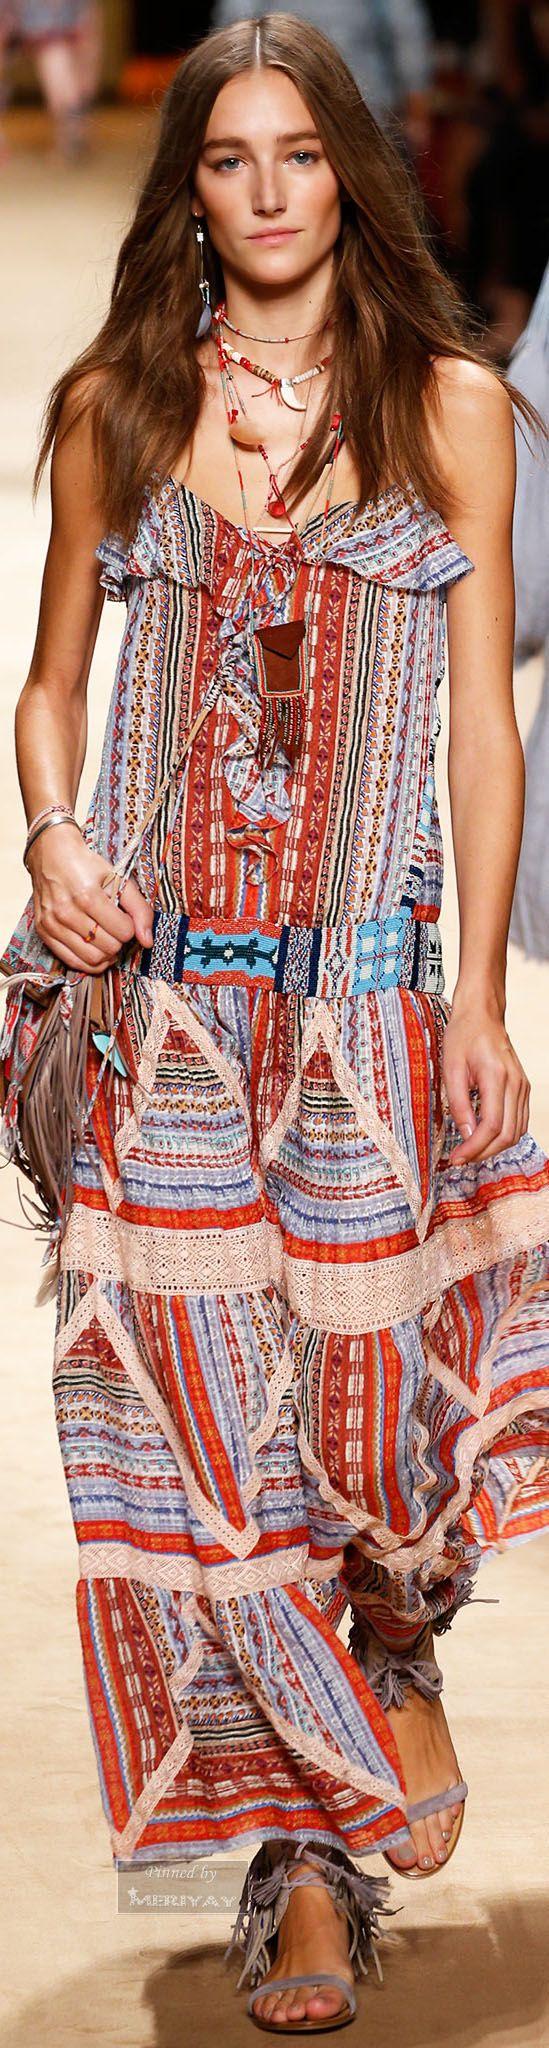 best my style images on pinterest my style boho fashion and